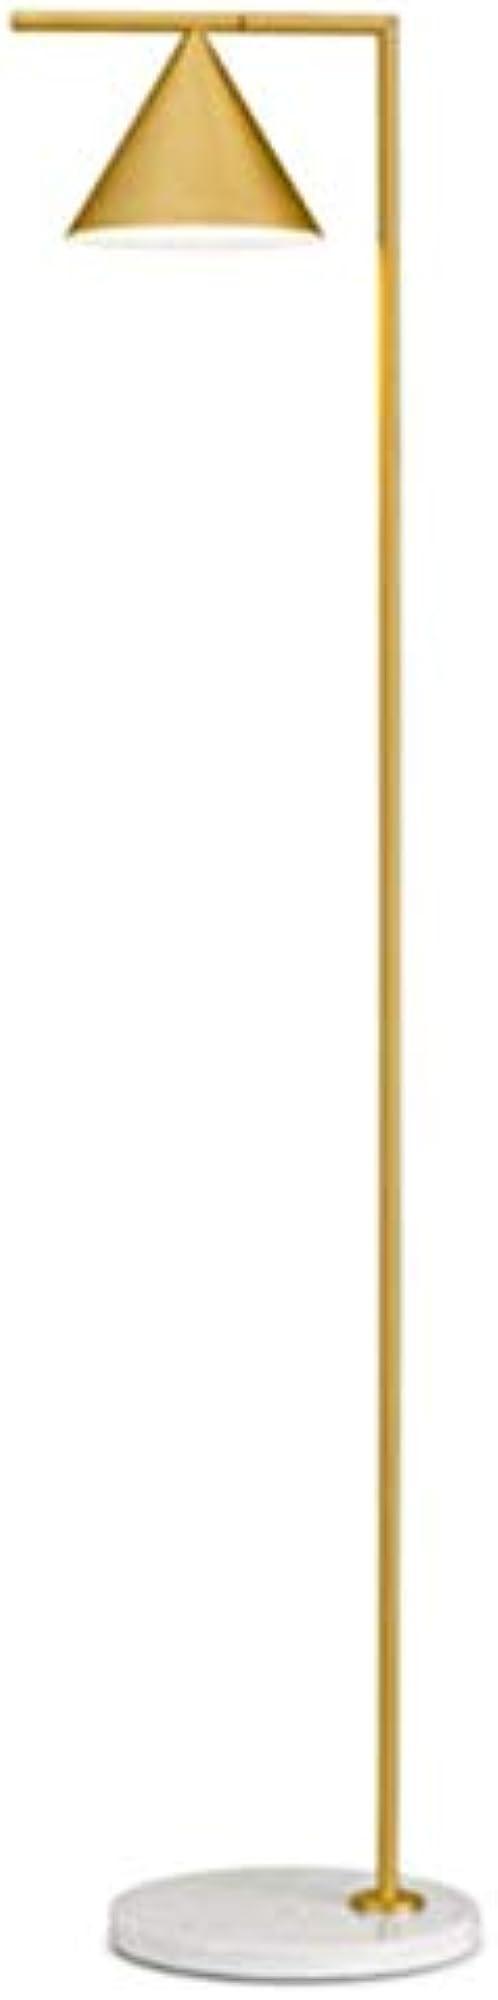 Flos captain flint led lampada da terra ottone spazzolato/marmo bianco F1530059